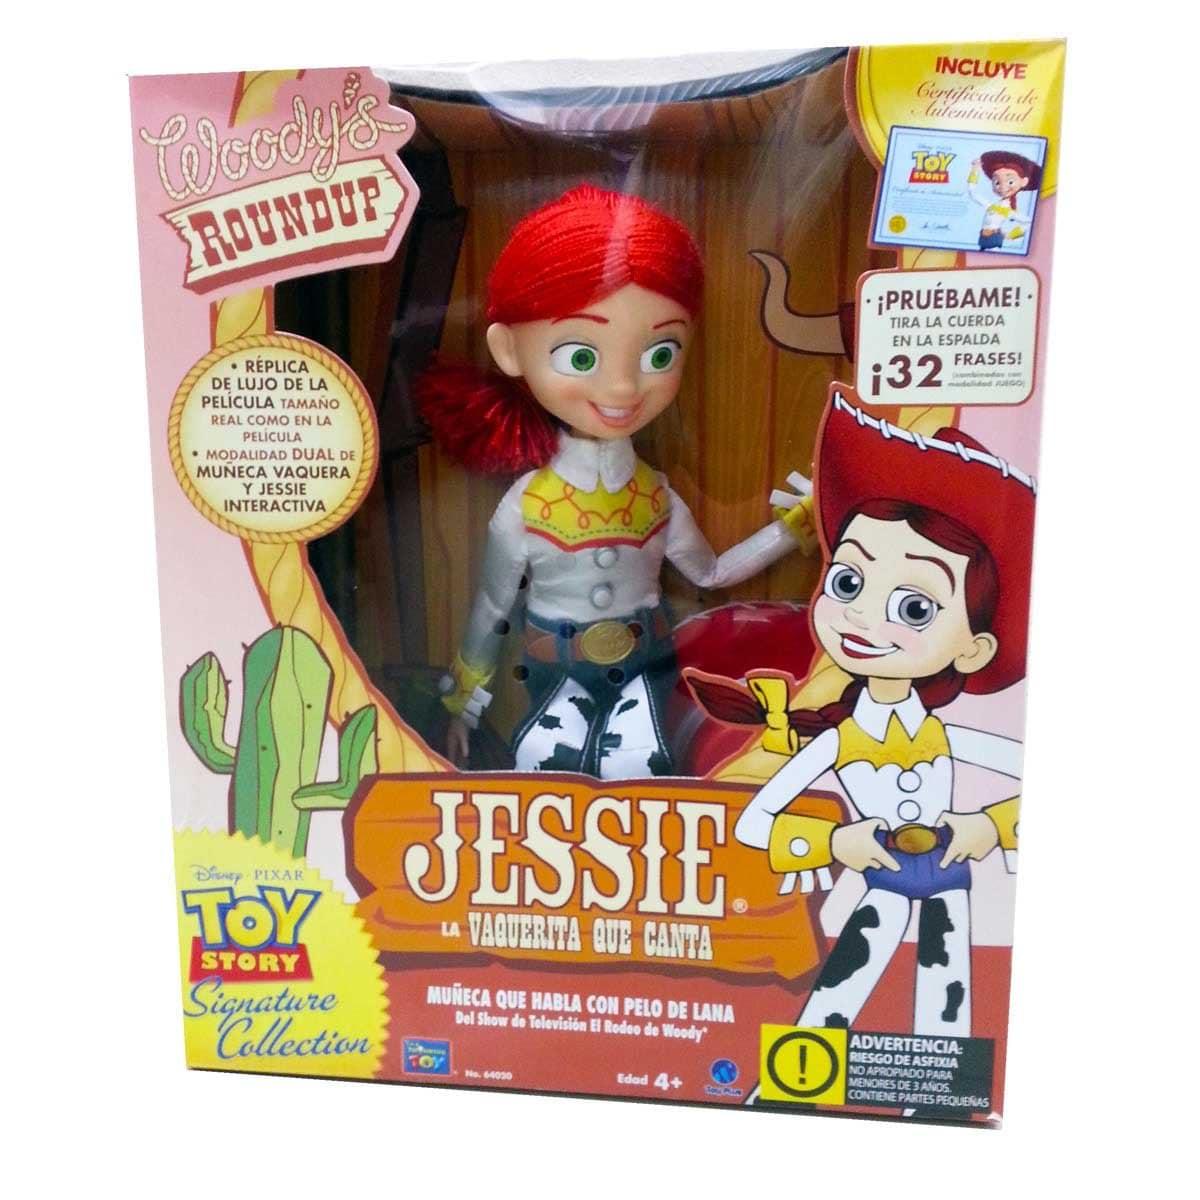 Toy Story Jessie la Vaquera